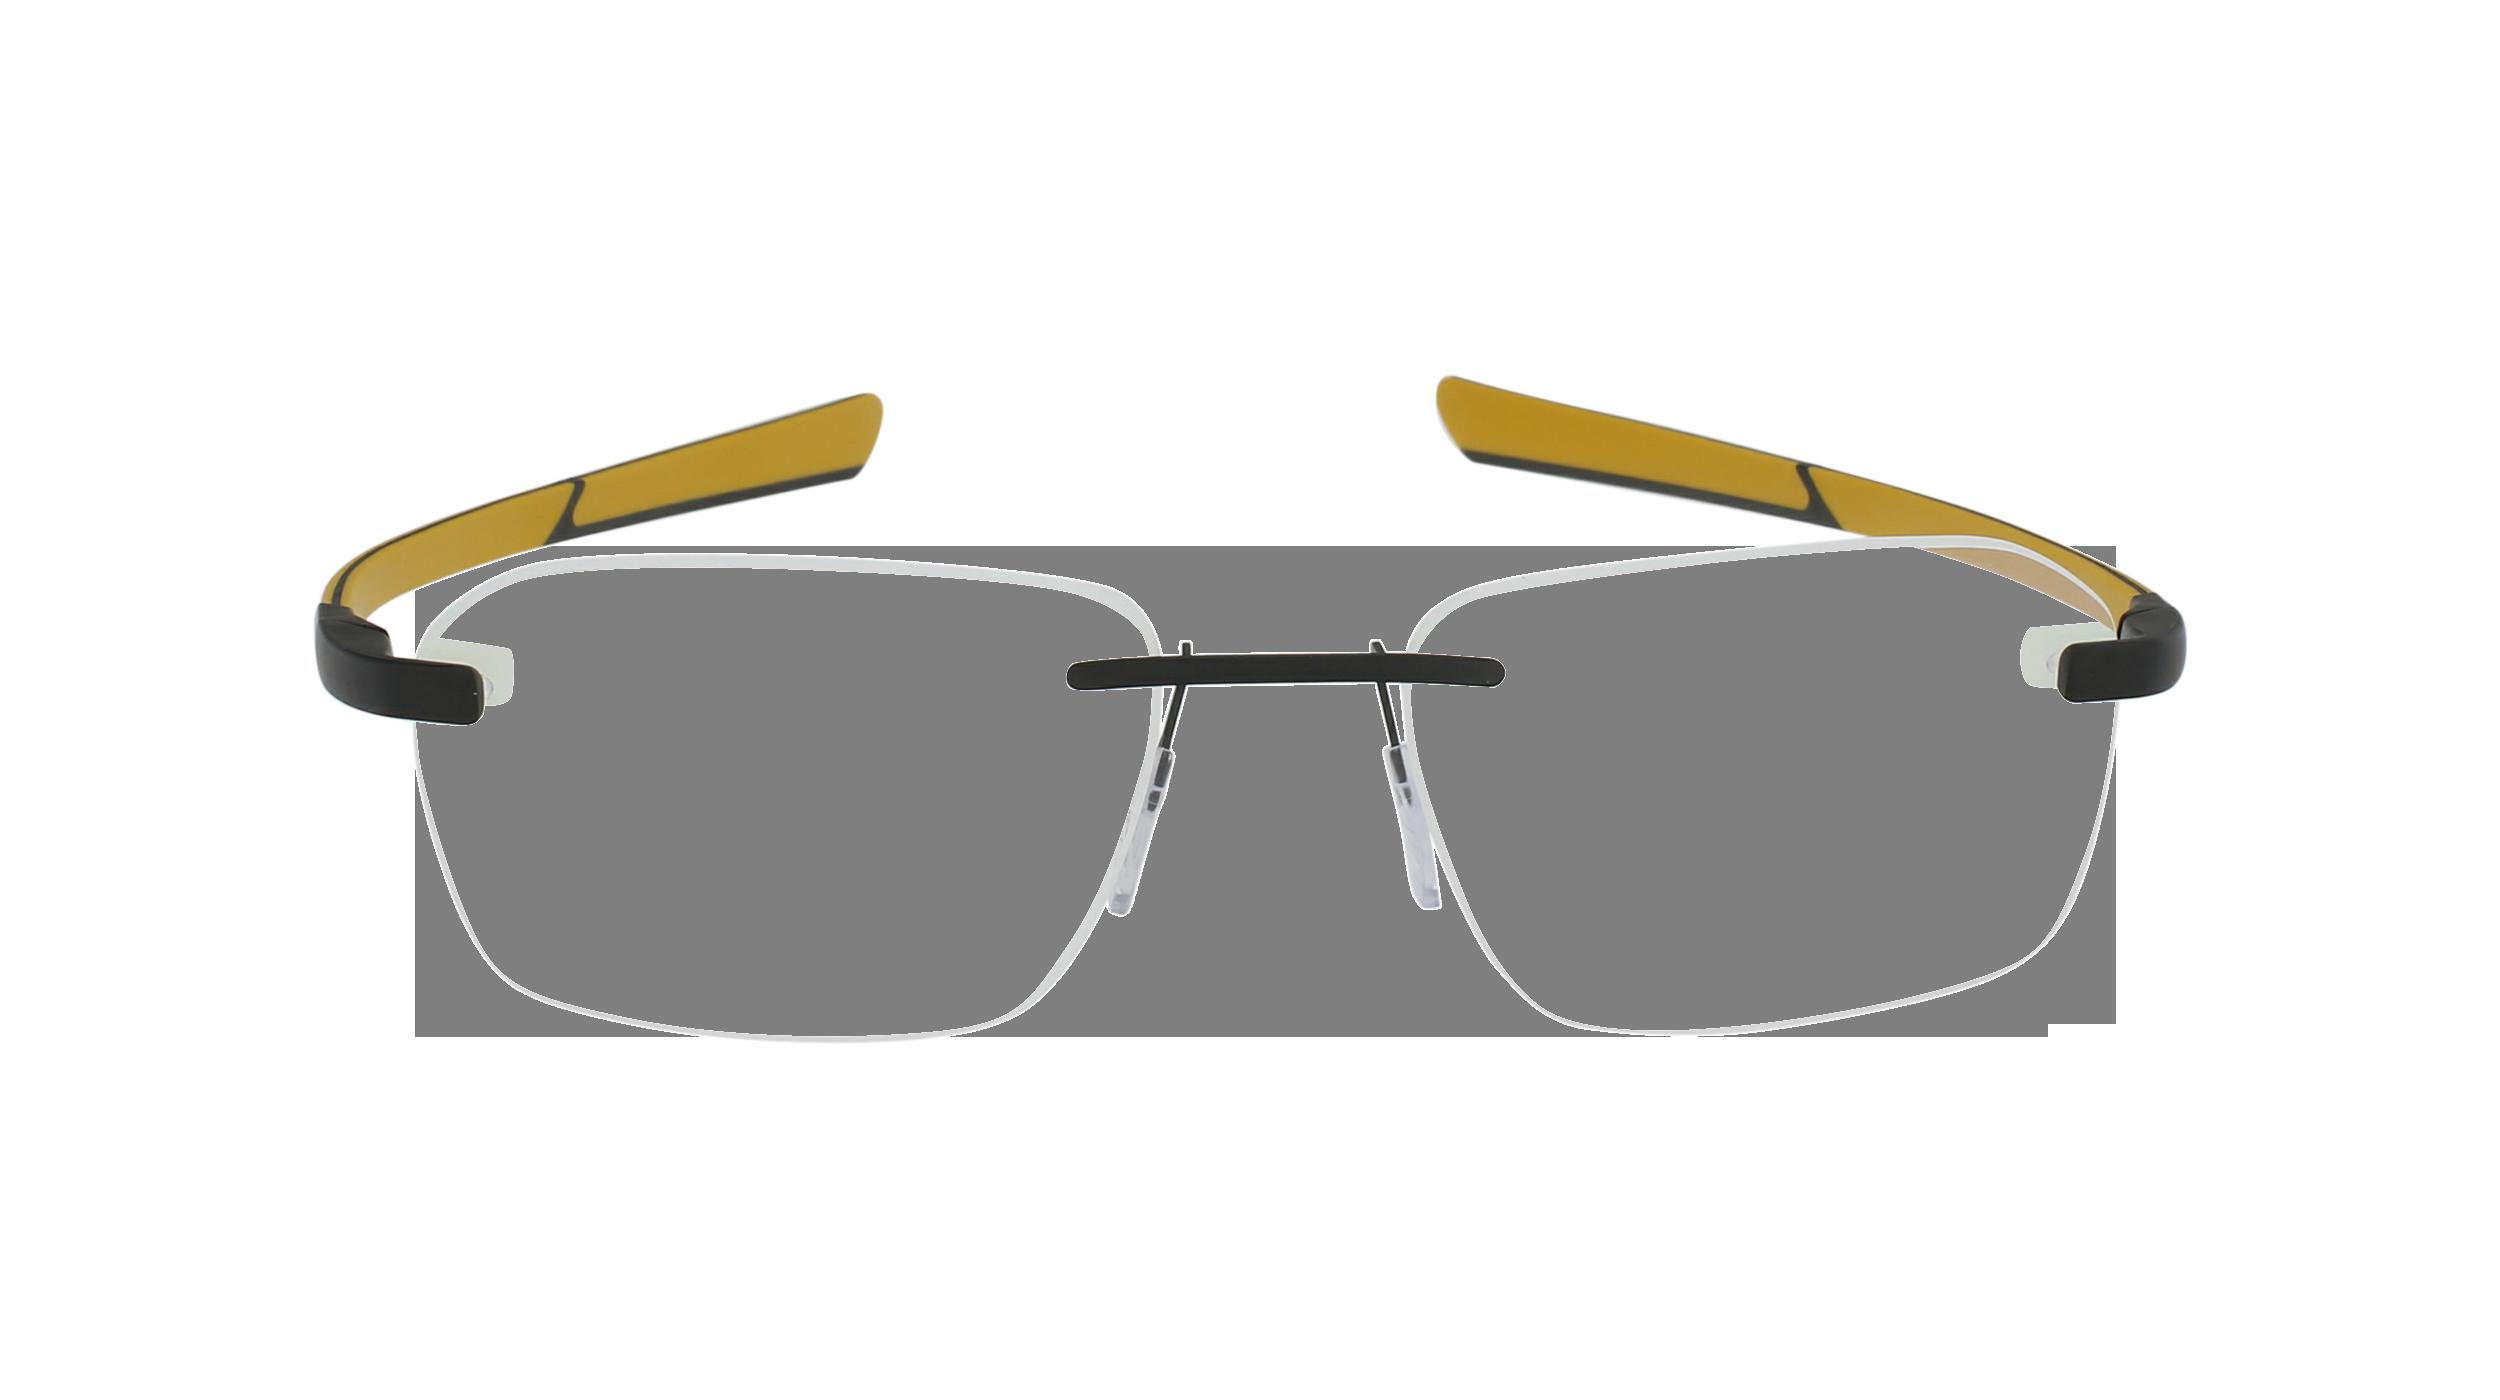 Style Name: MLSUPO24.C04.56